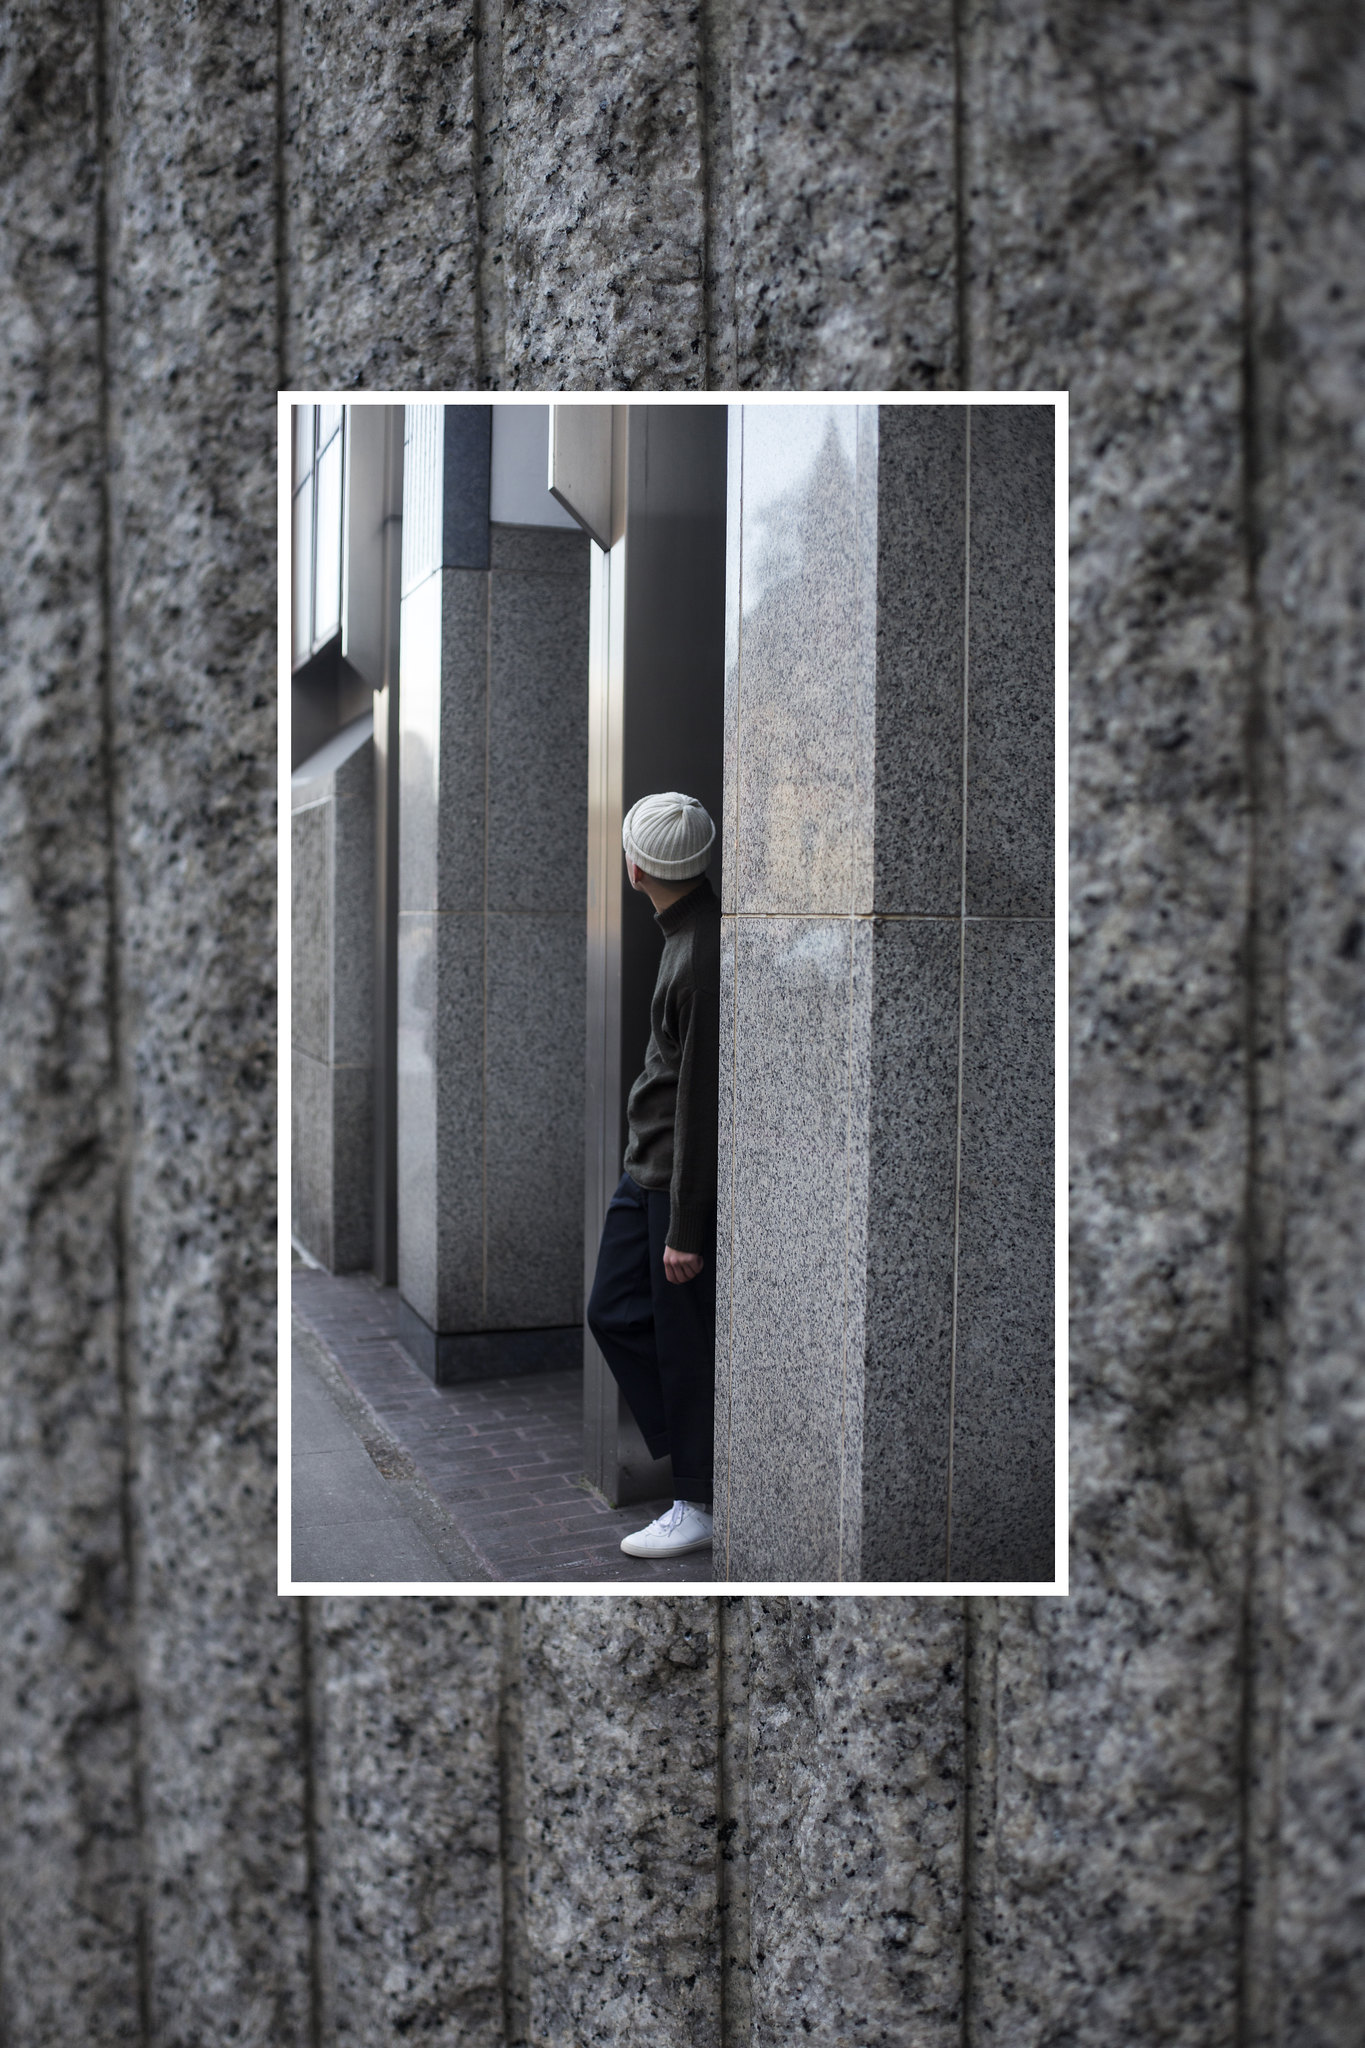 Jordan_Bunker_zalando_casual_9